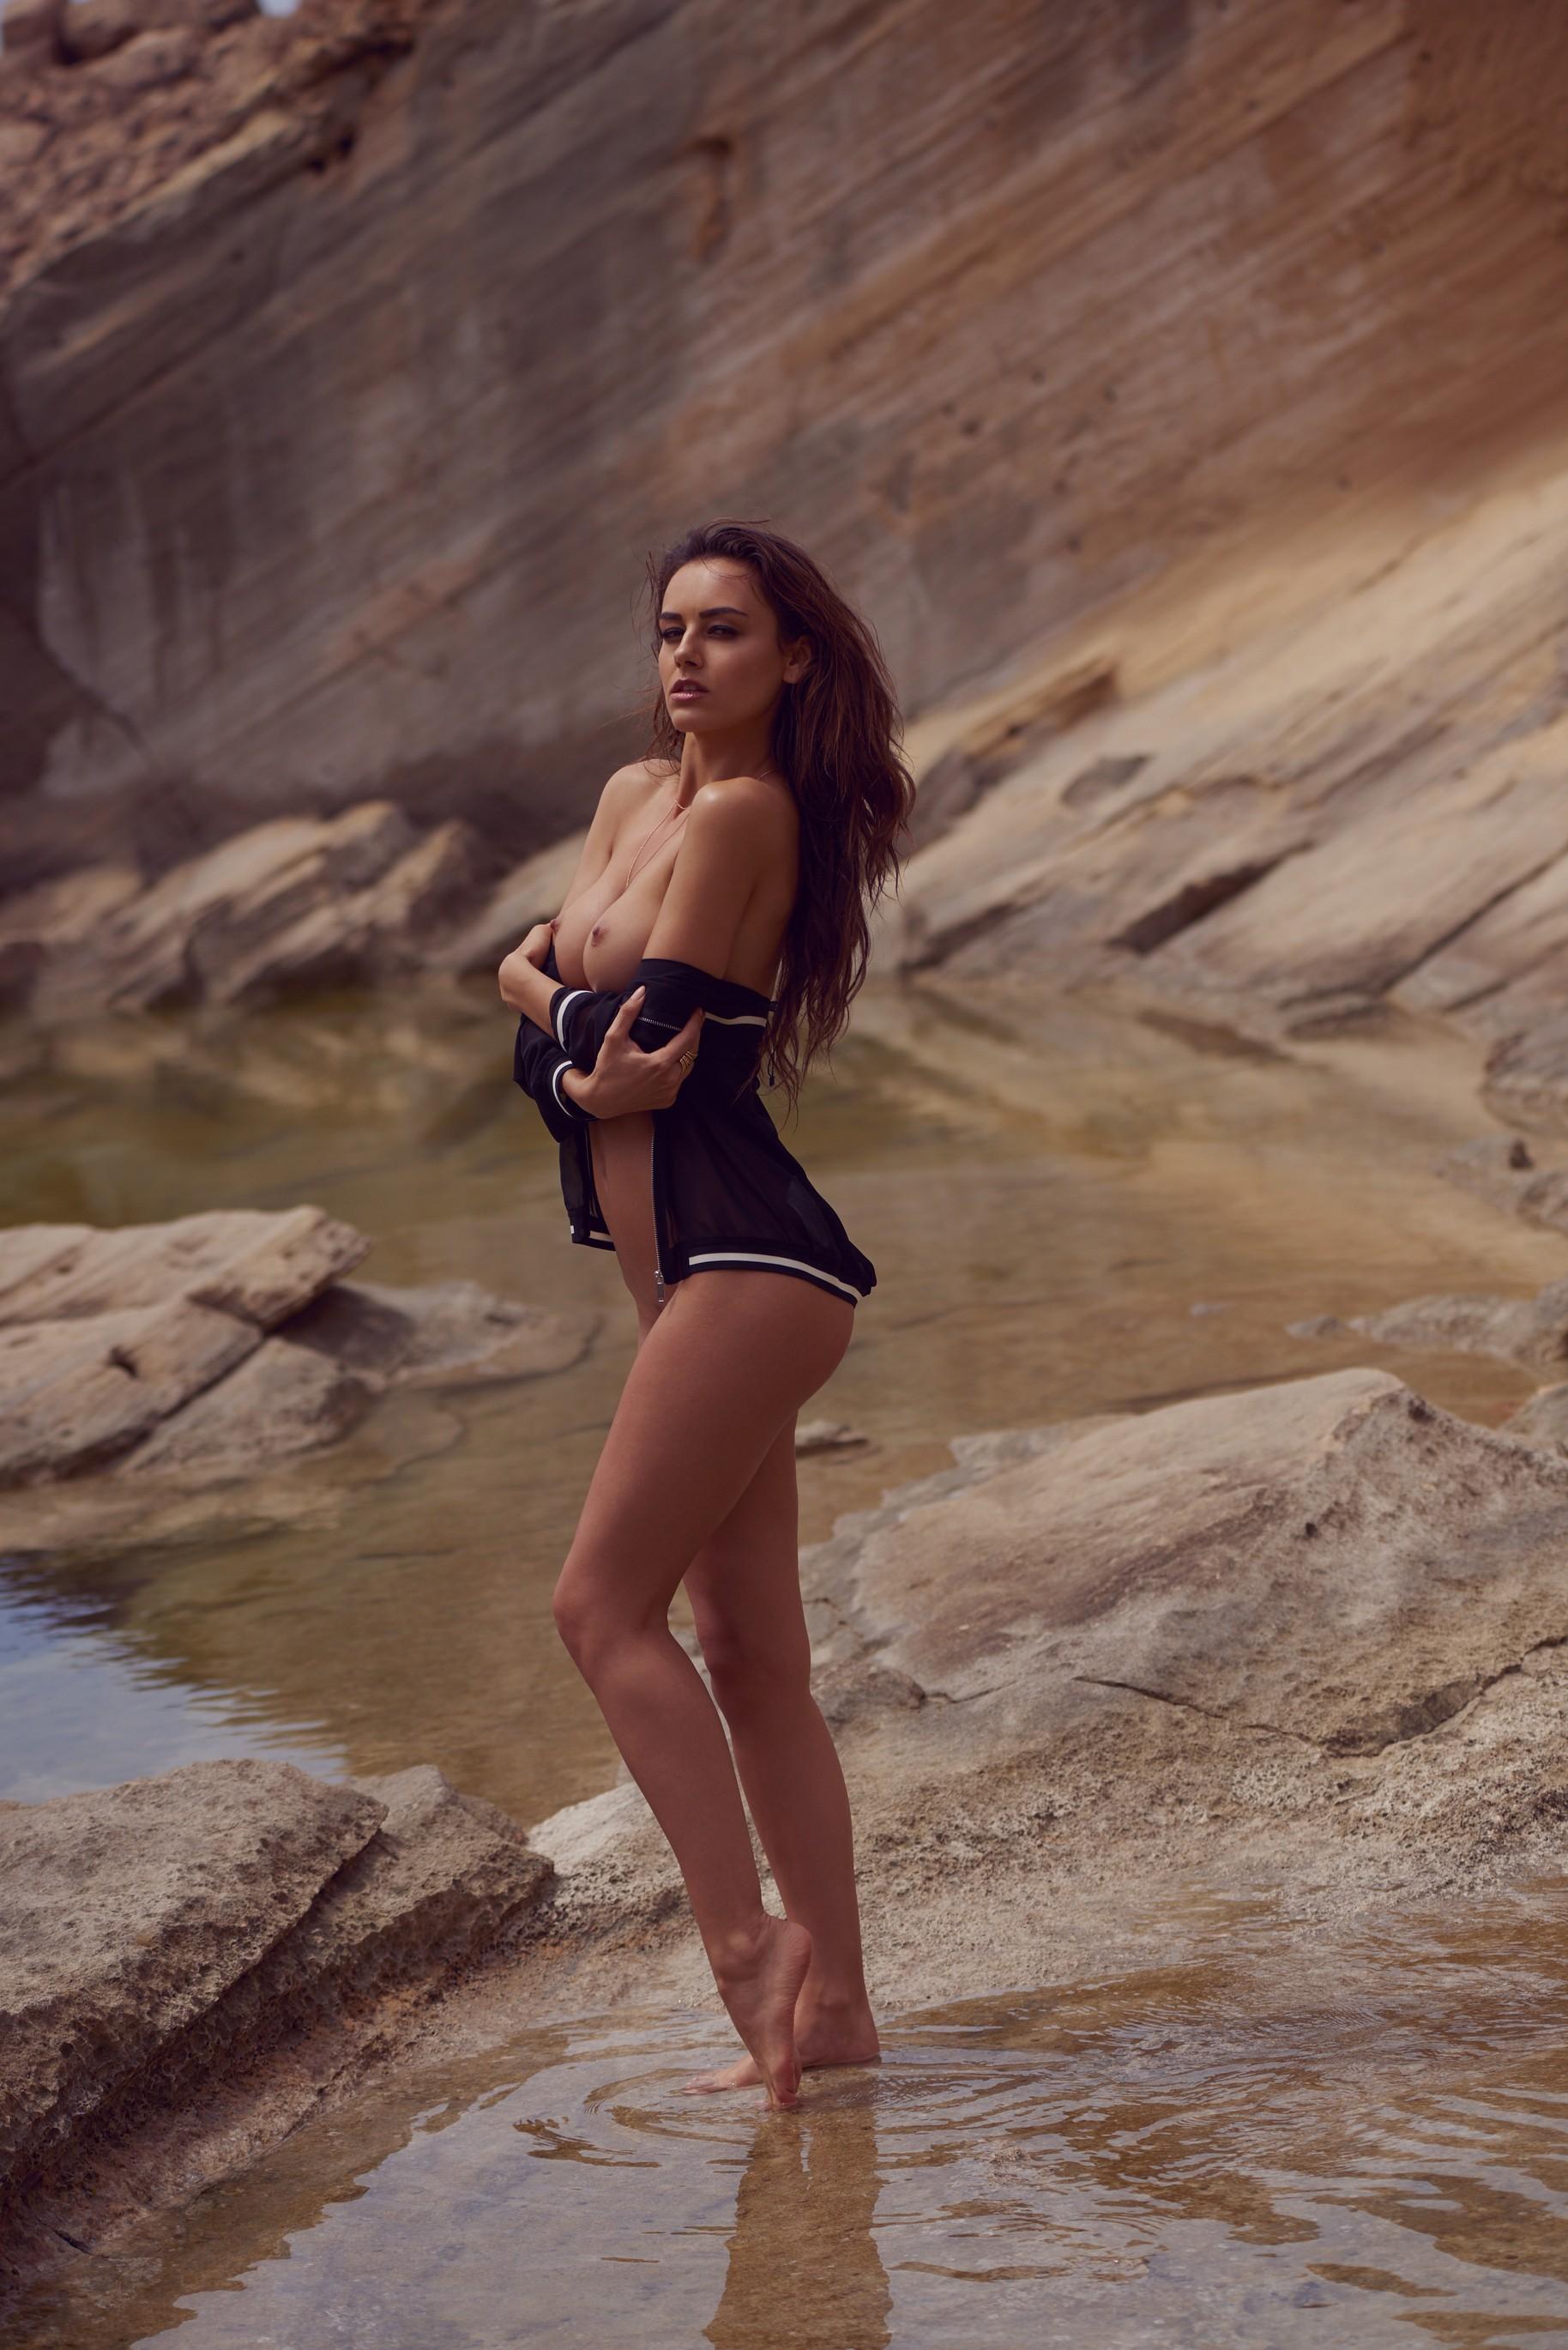 veronika-klimovits-naked-diving-motorboat-seaside-playboy-26